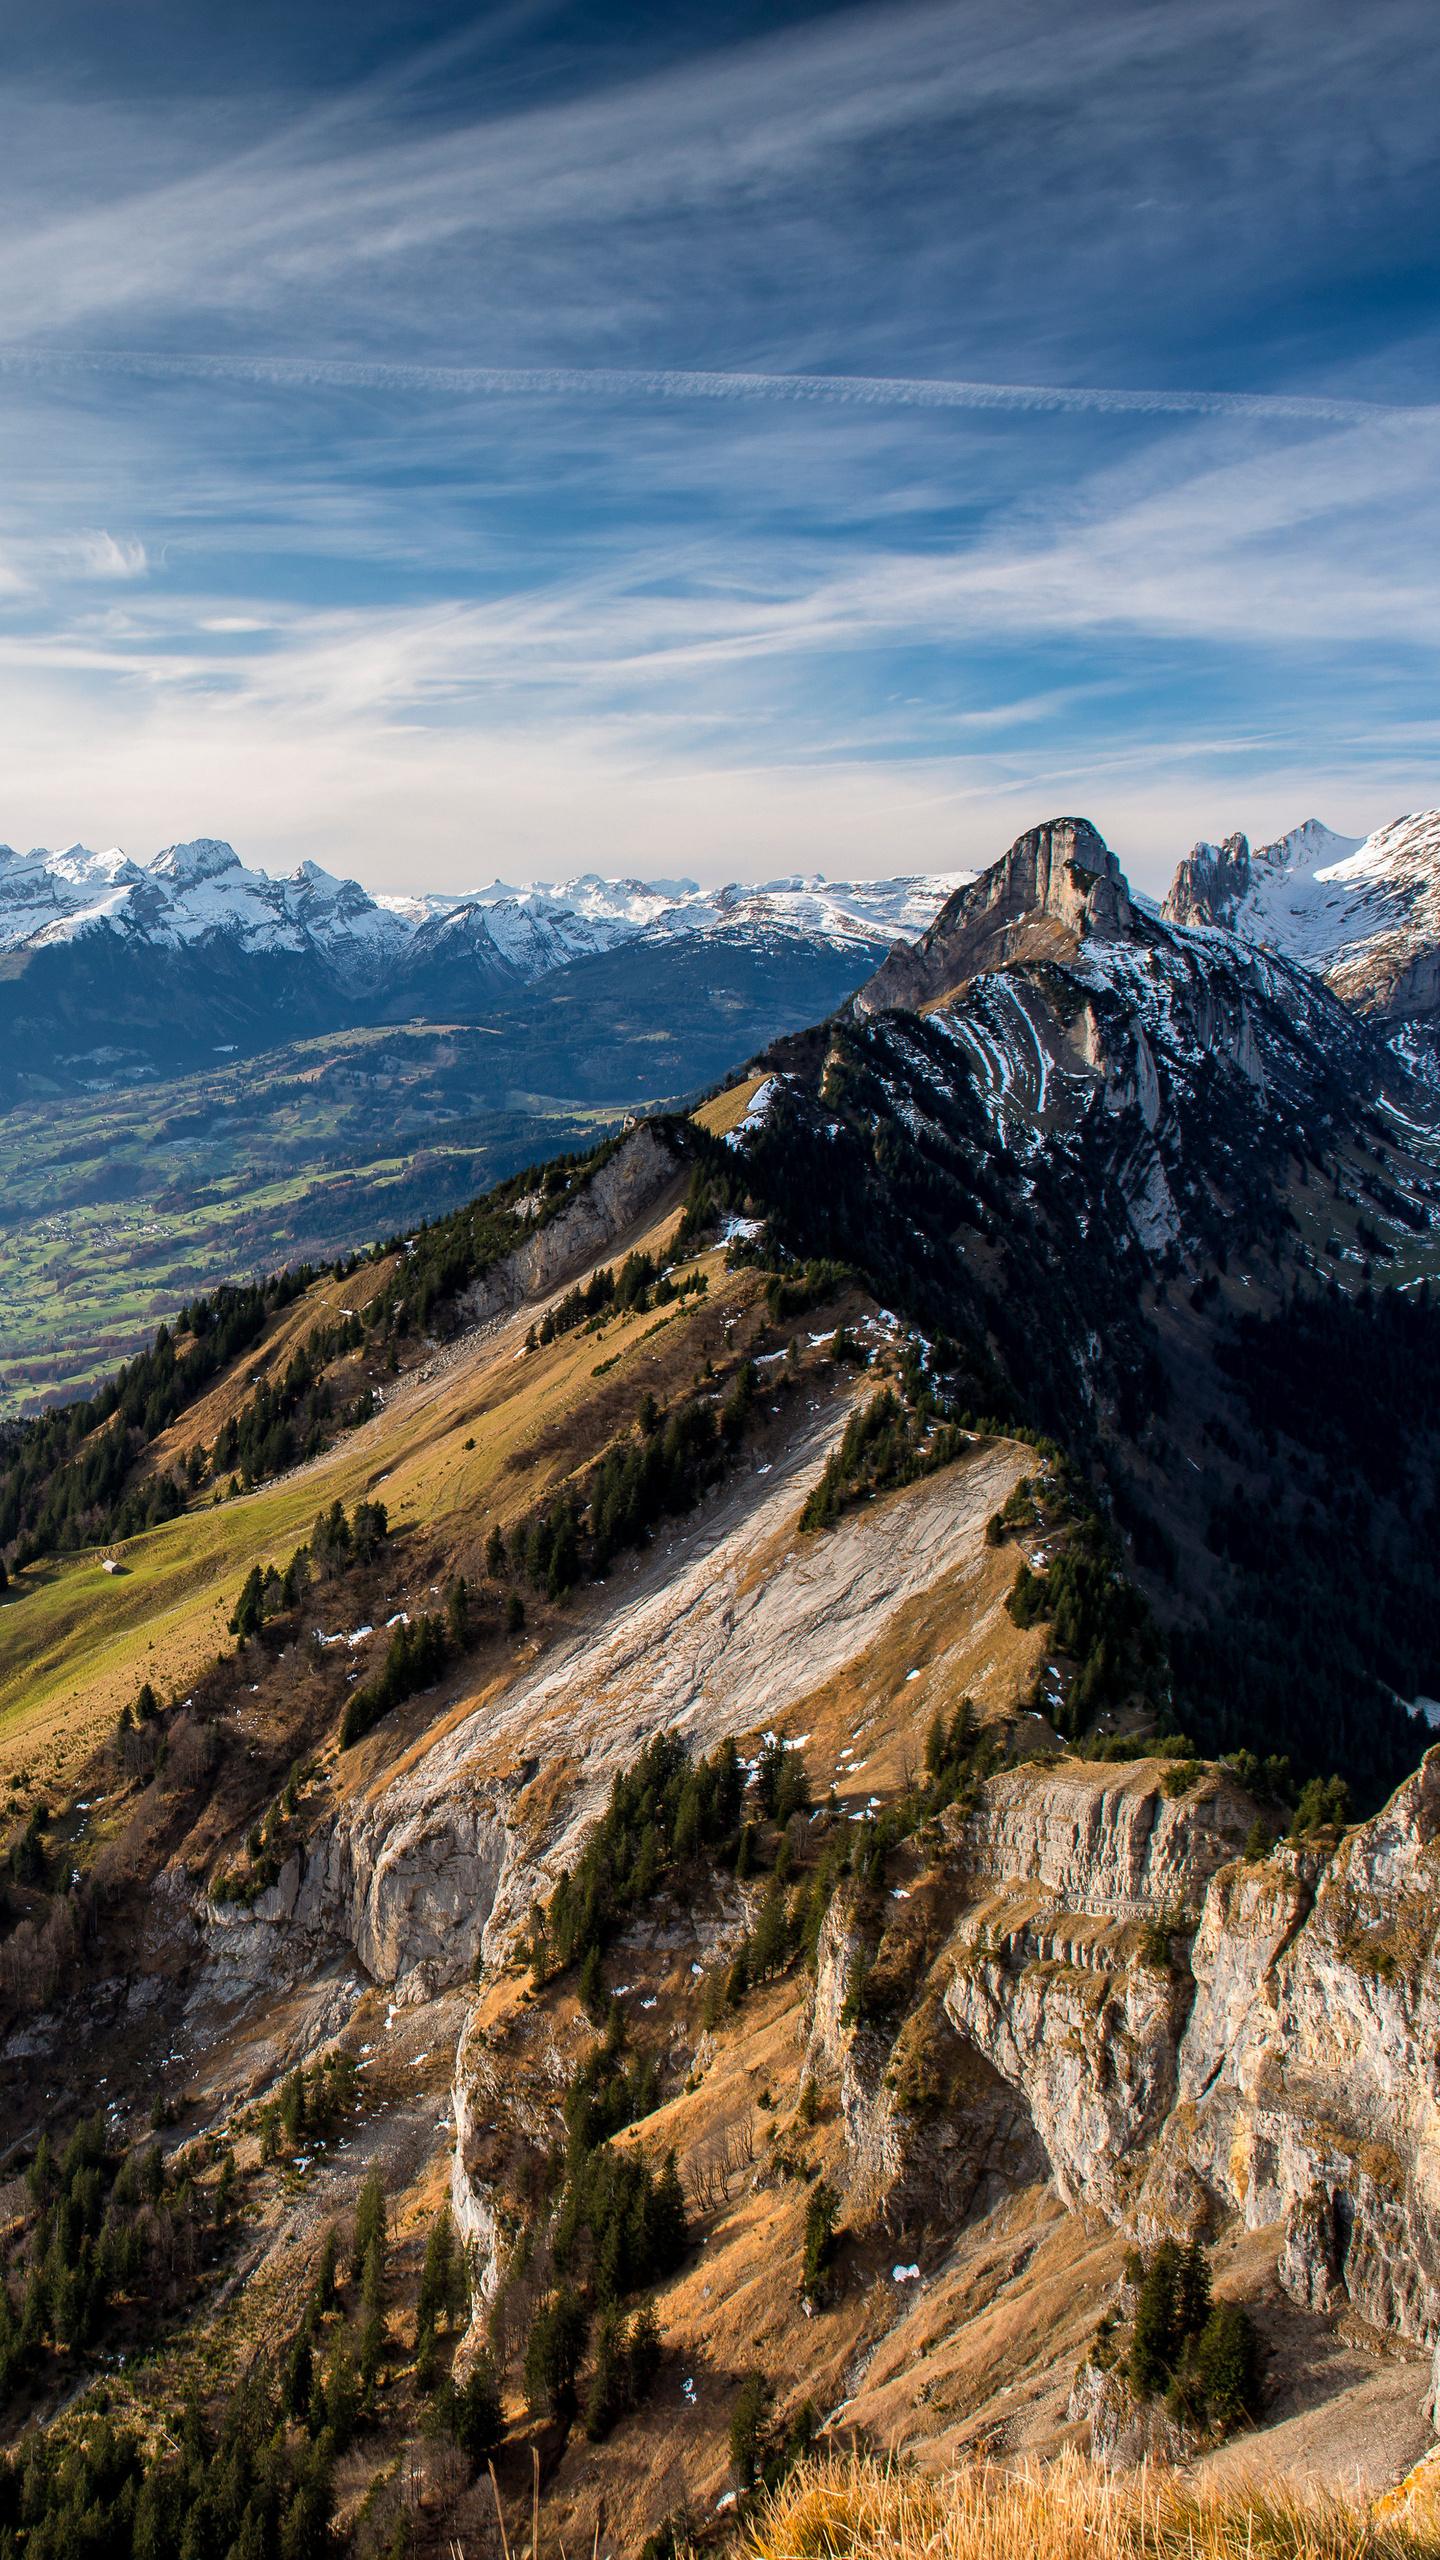 hoher-kasten-alps-valley-5k-8c.jpg